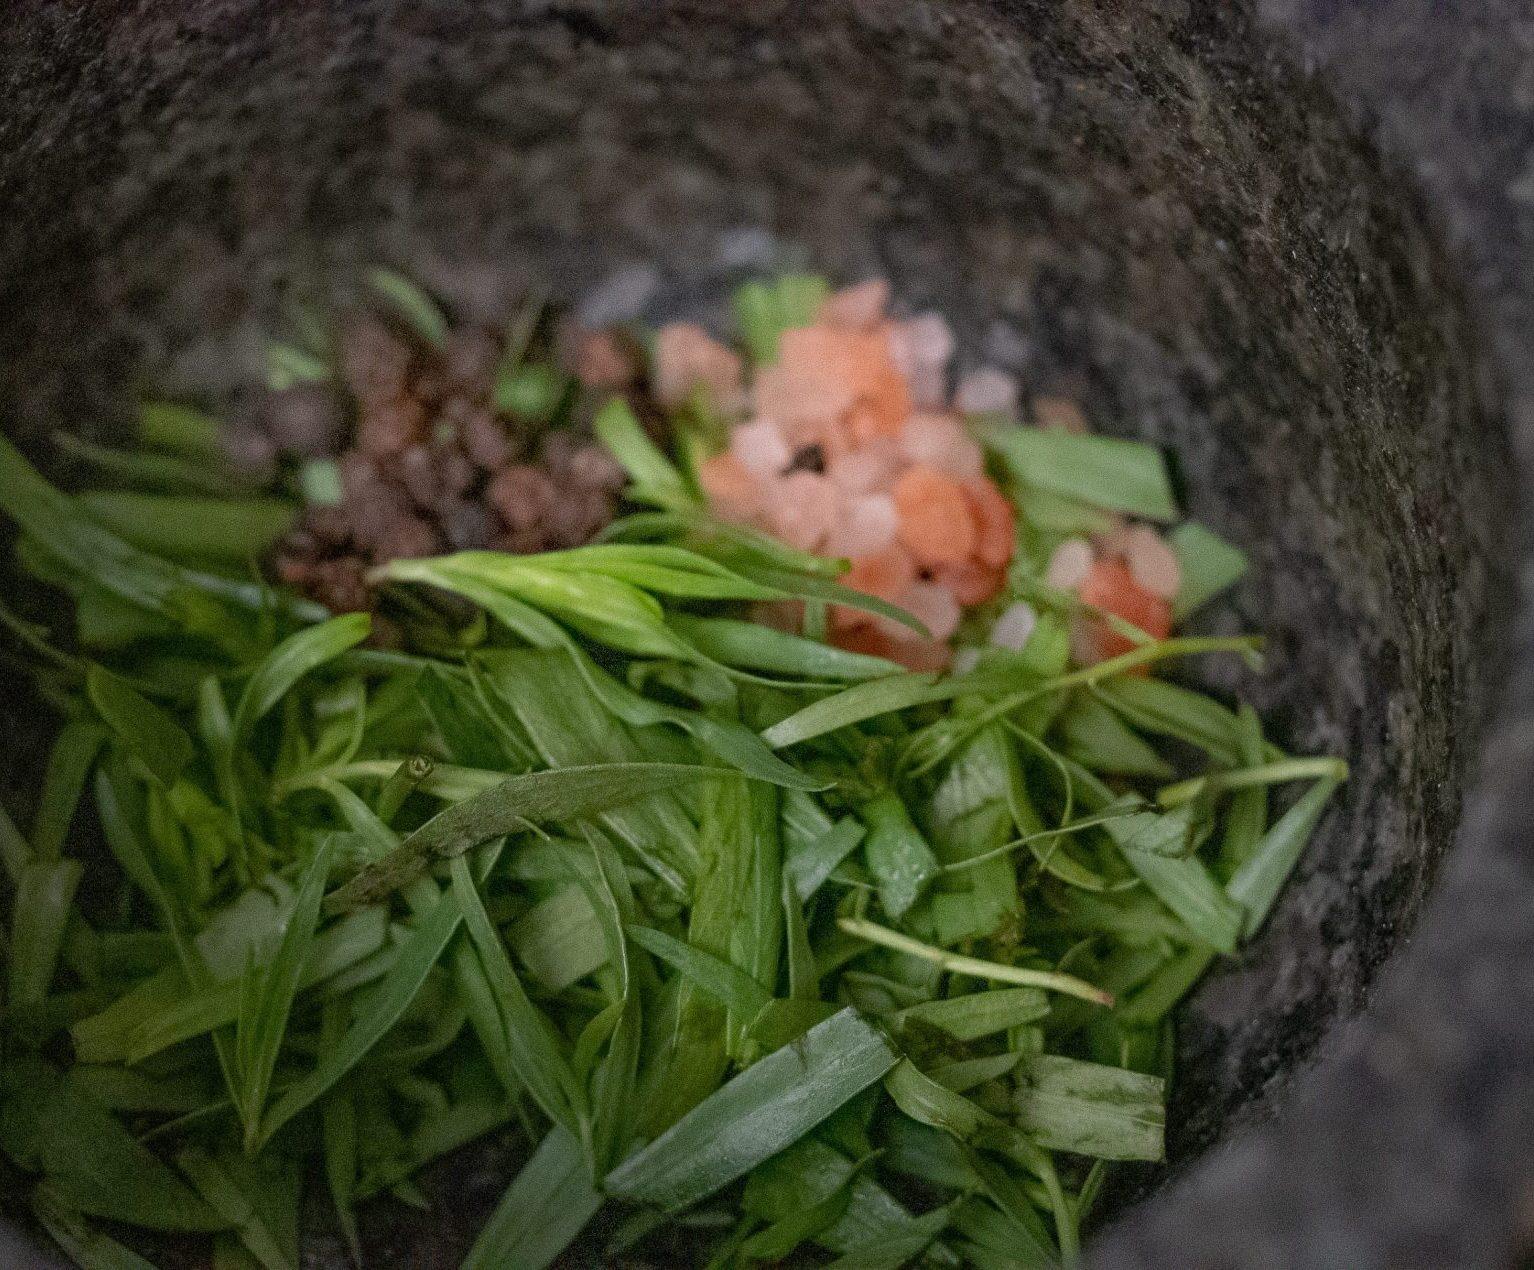 tarragon leaf, coarse pink salt and peppercorns in a grey mortar.